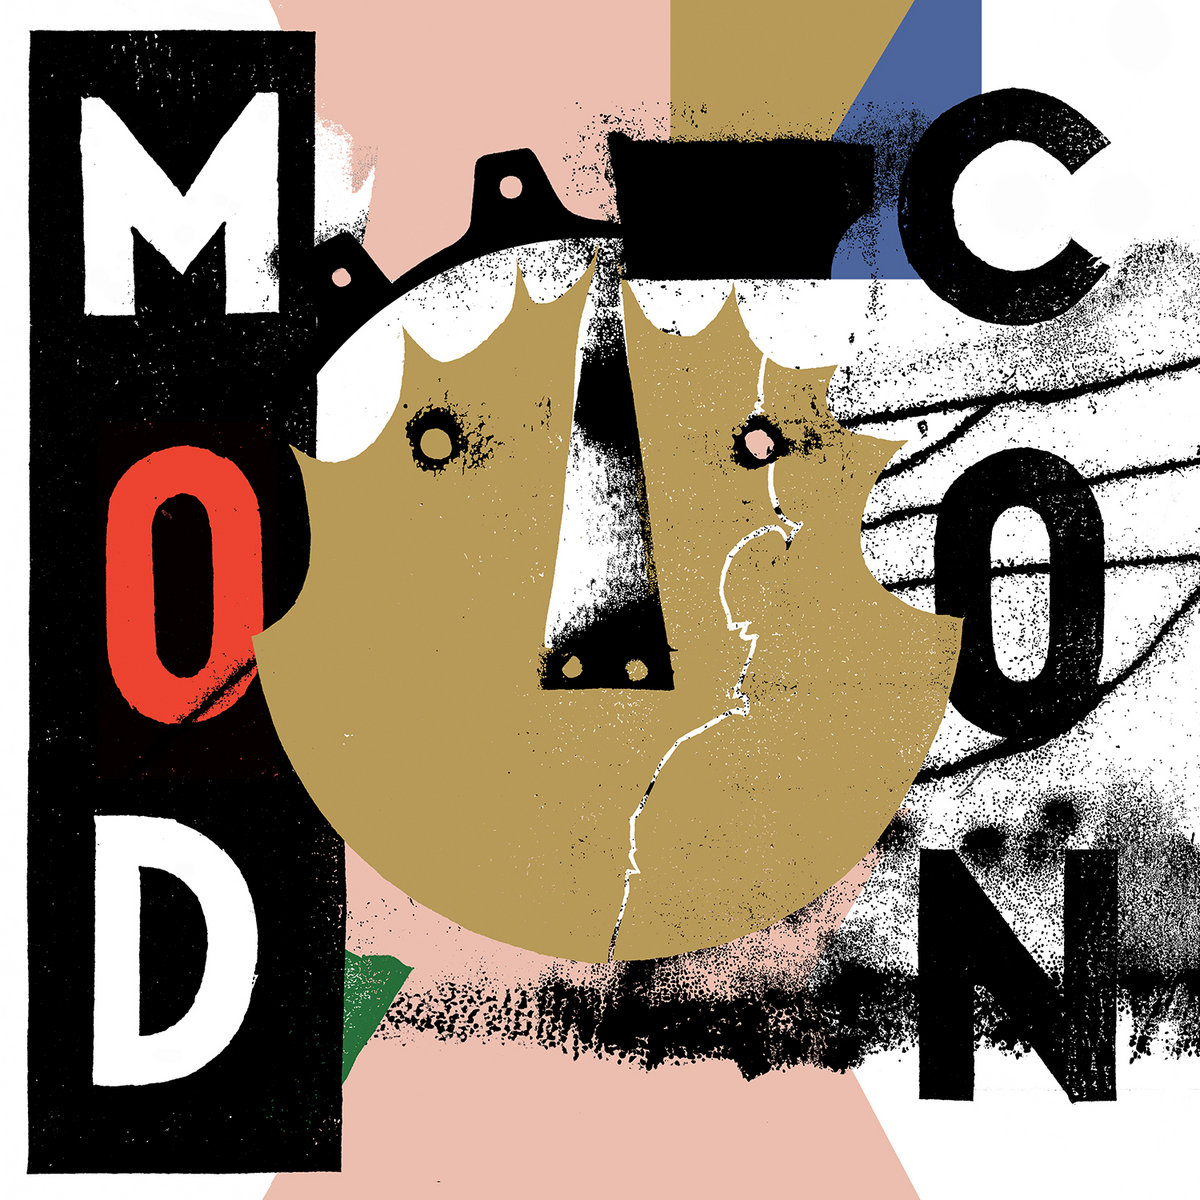 Mod Con album Modern Condition